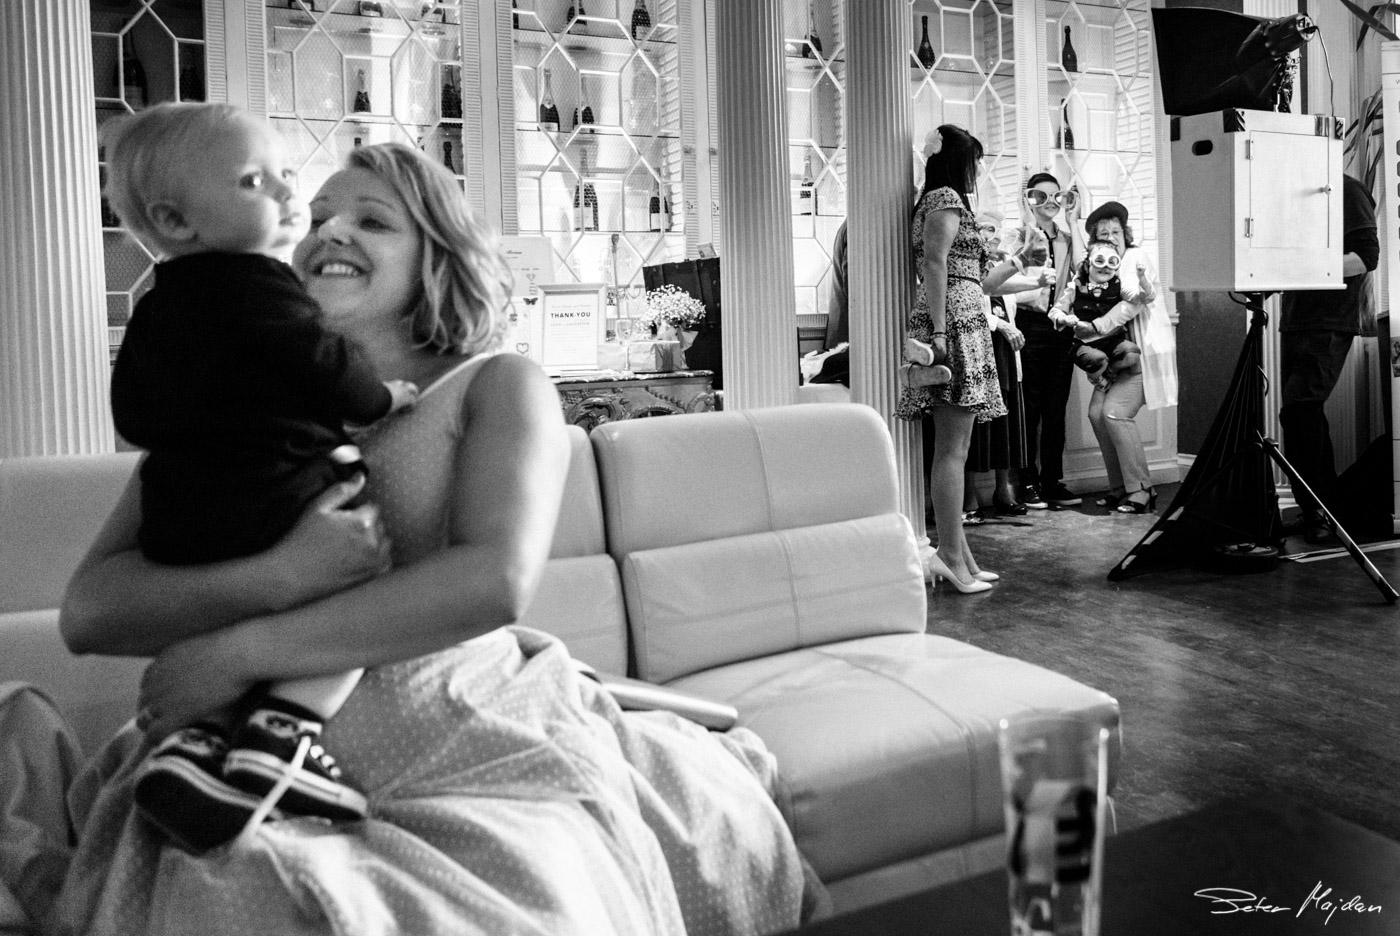 Colwick-hall-wedding-photography-61.jpg